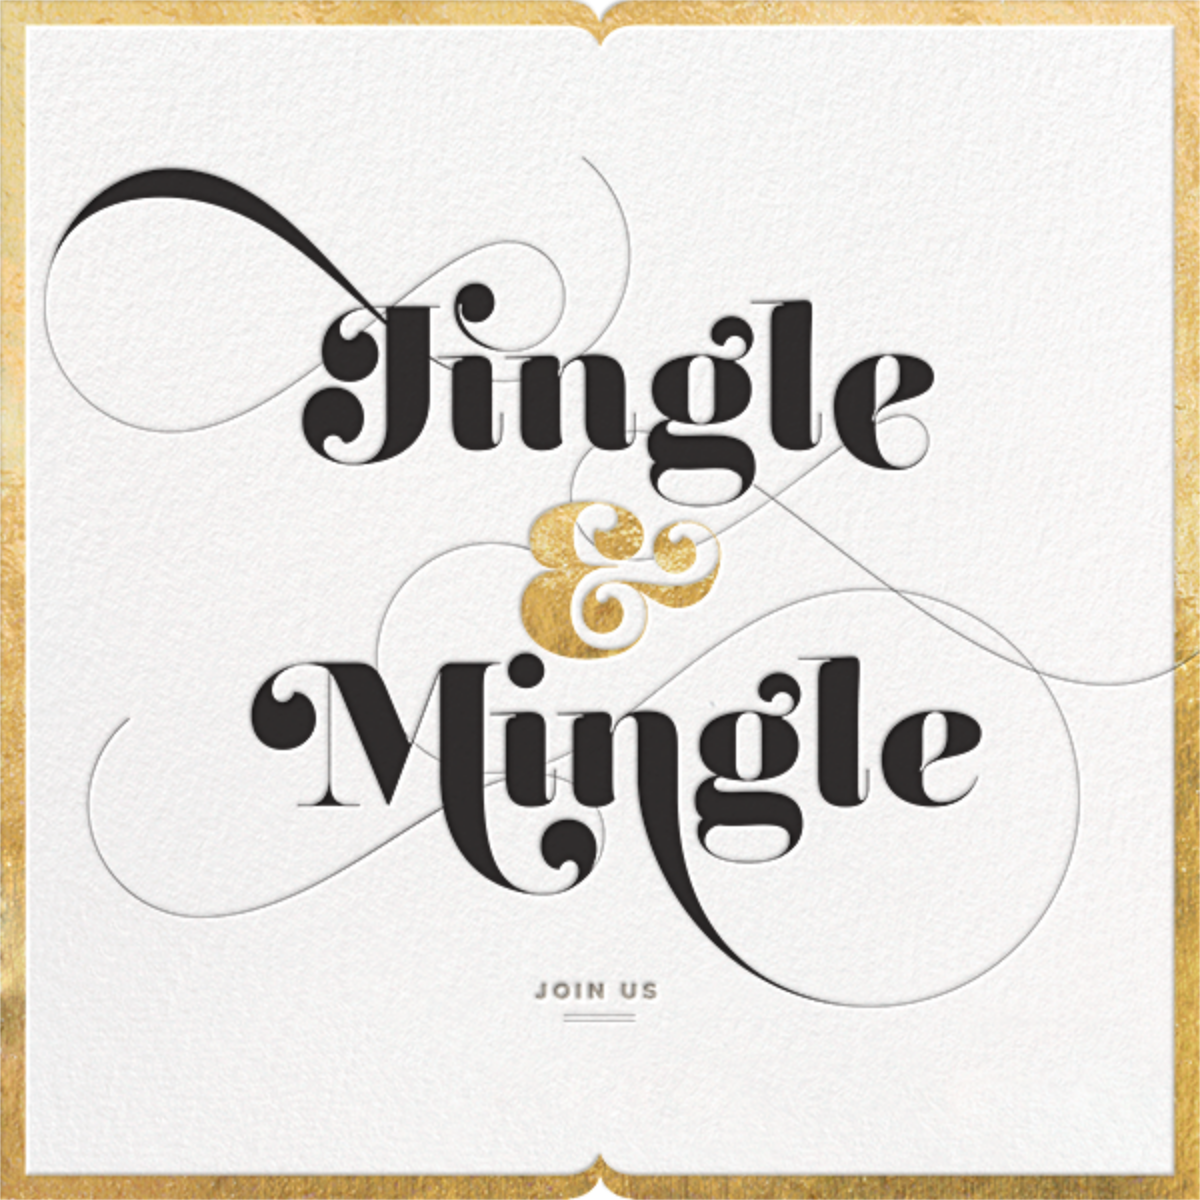 Jingle & Mingle - Gold - bluepoolroad - Holiday save the dates